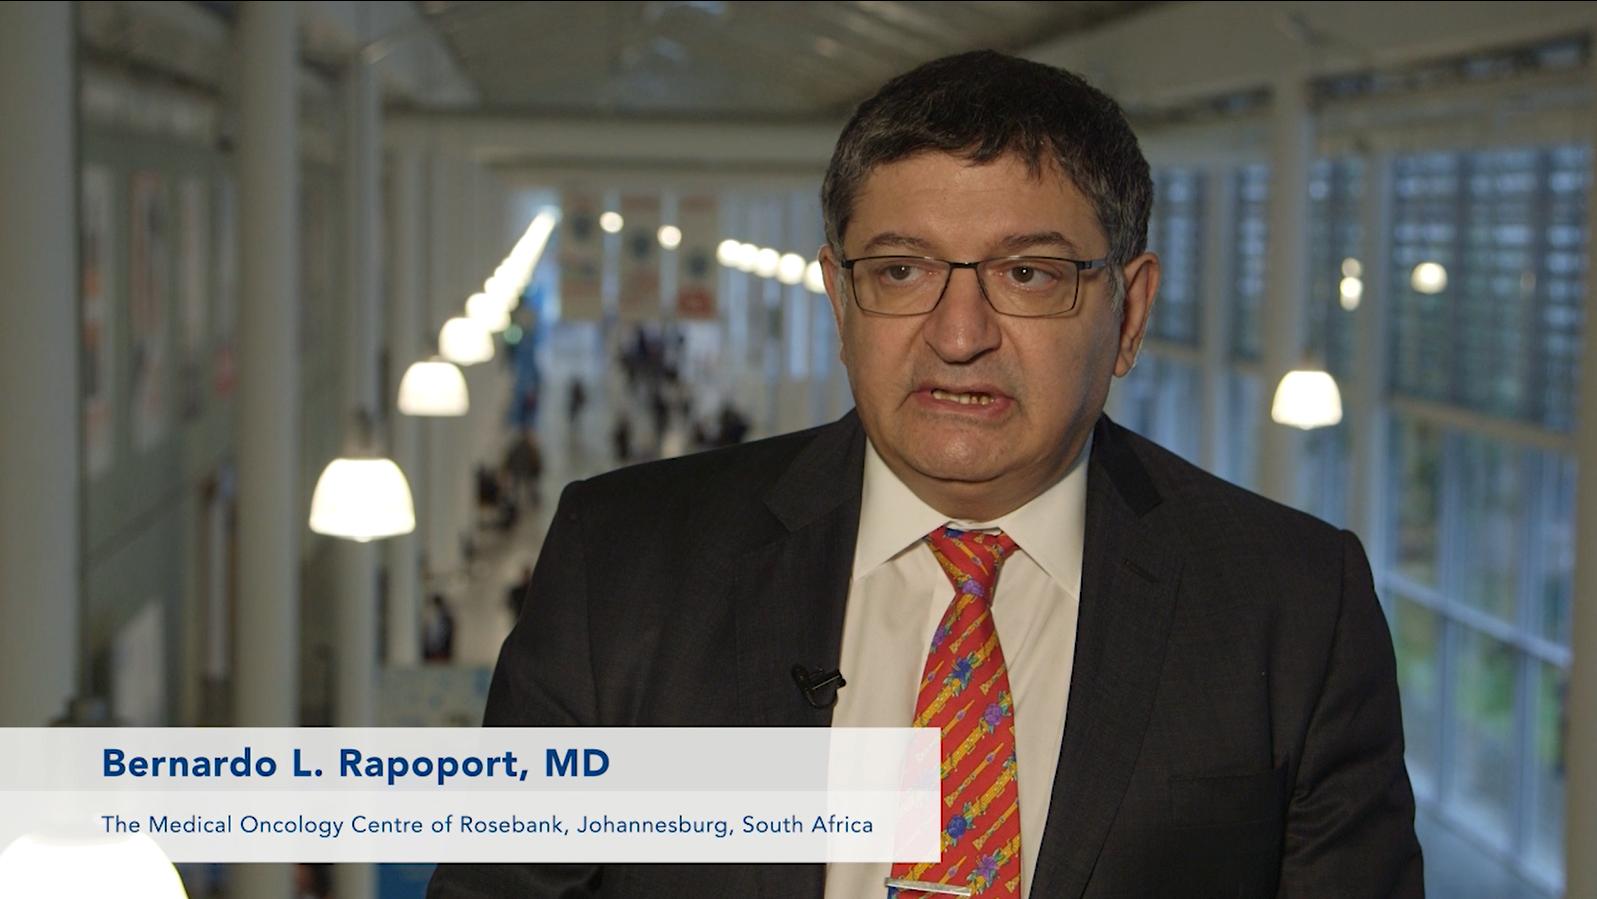 Bernardo Rapoport – ECC 2015, Vienna – Part 2: Clinical Impact of NK1-receptor Antagonists in CINV